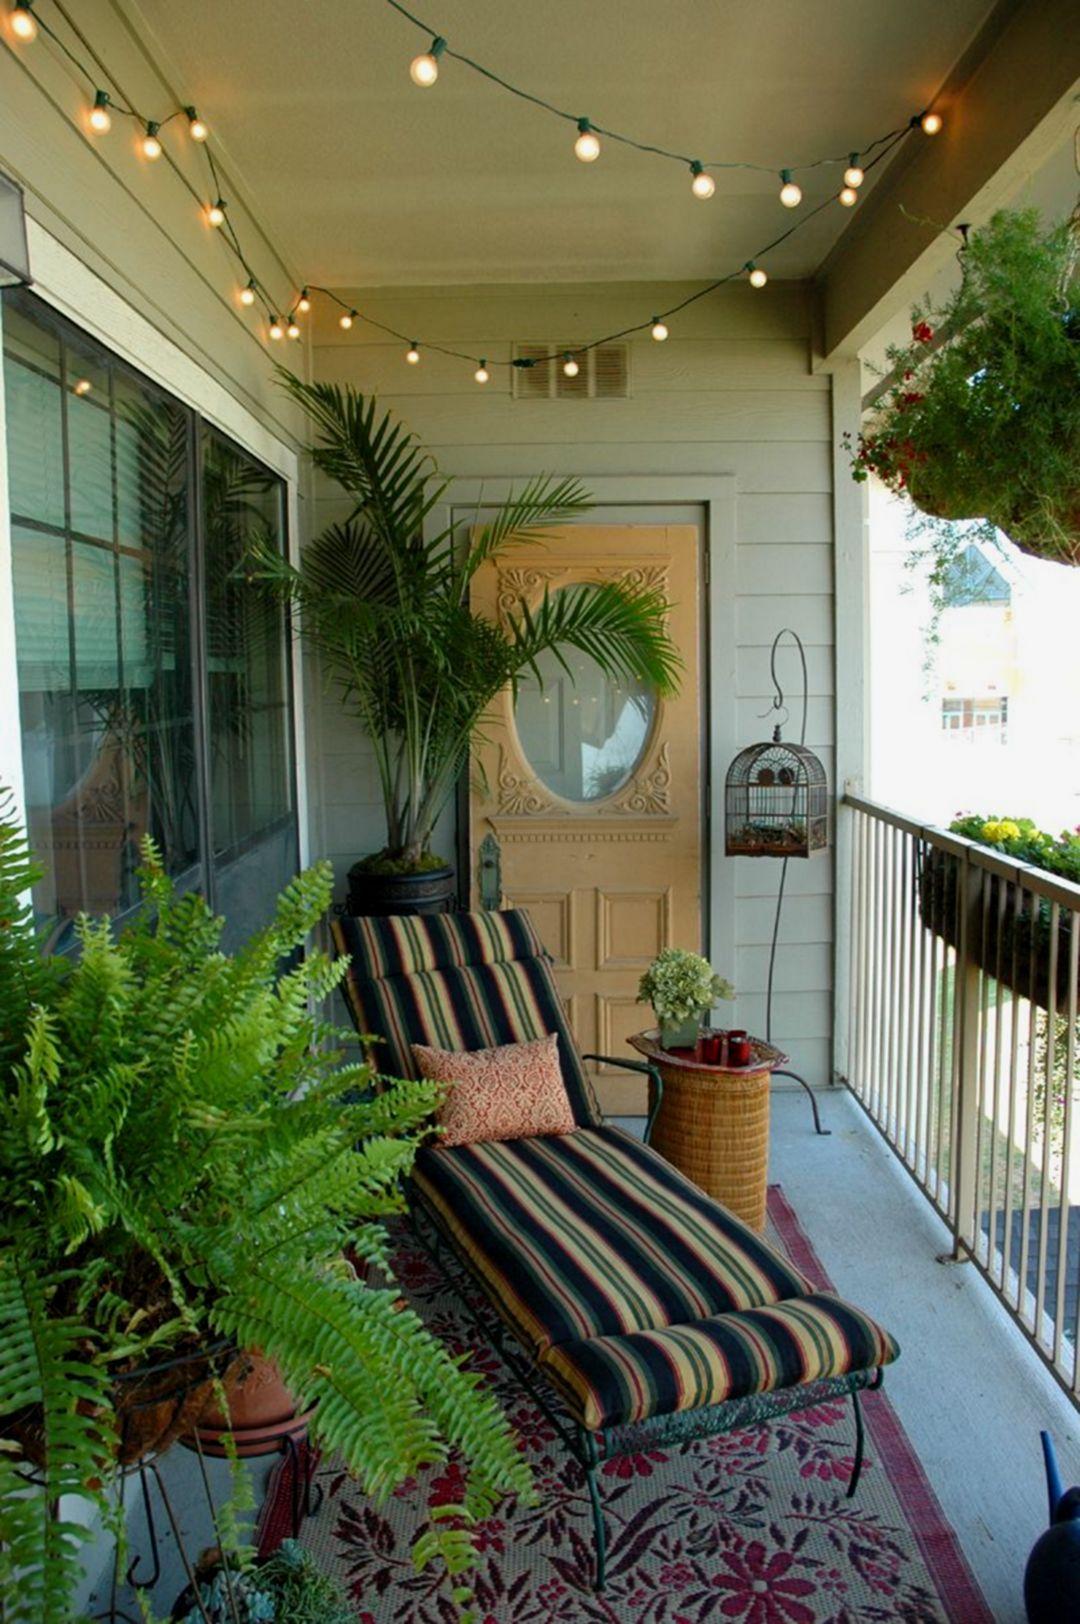 Amazing 10+ Small Apartment Balcony Ideas For Cozy ...